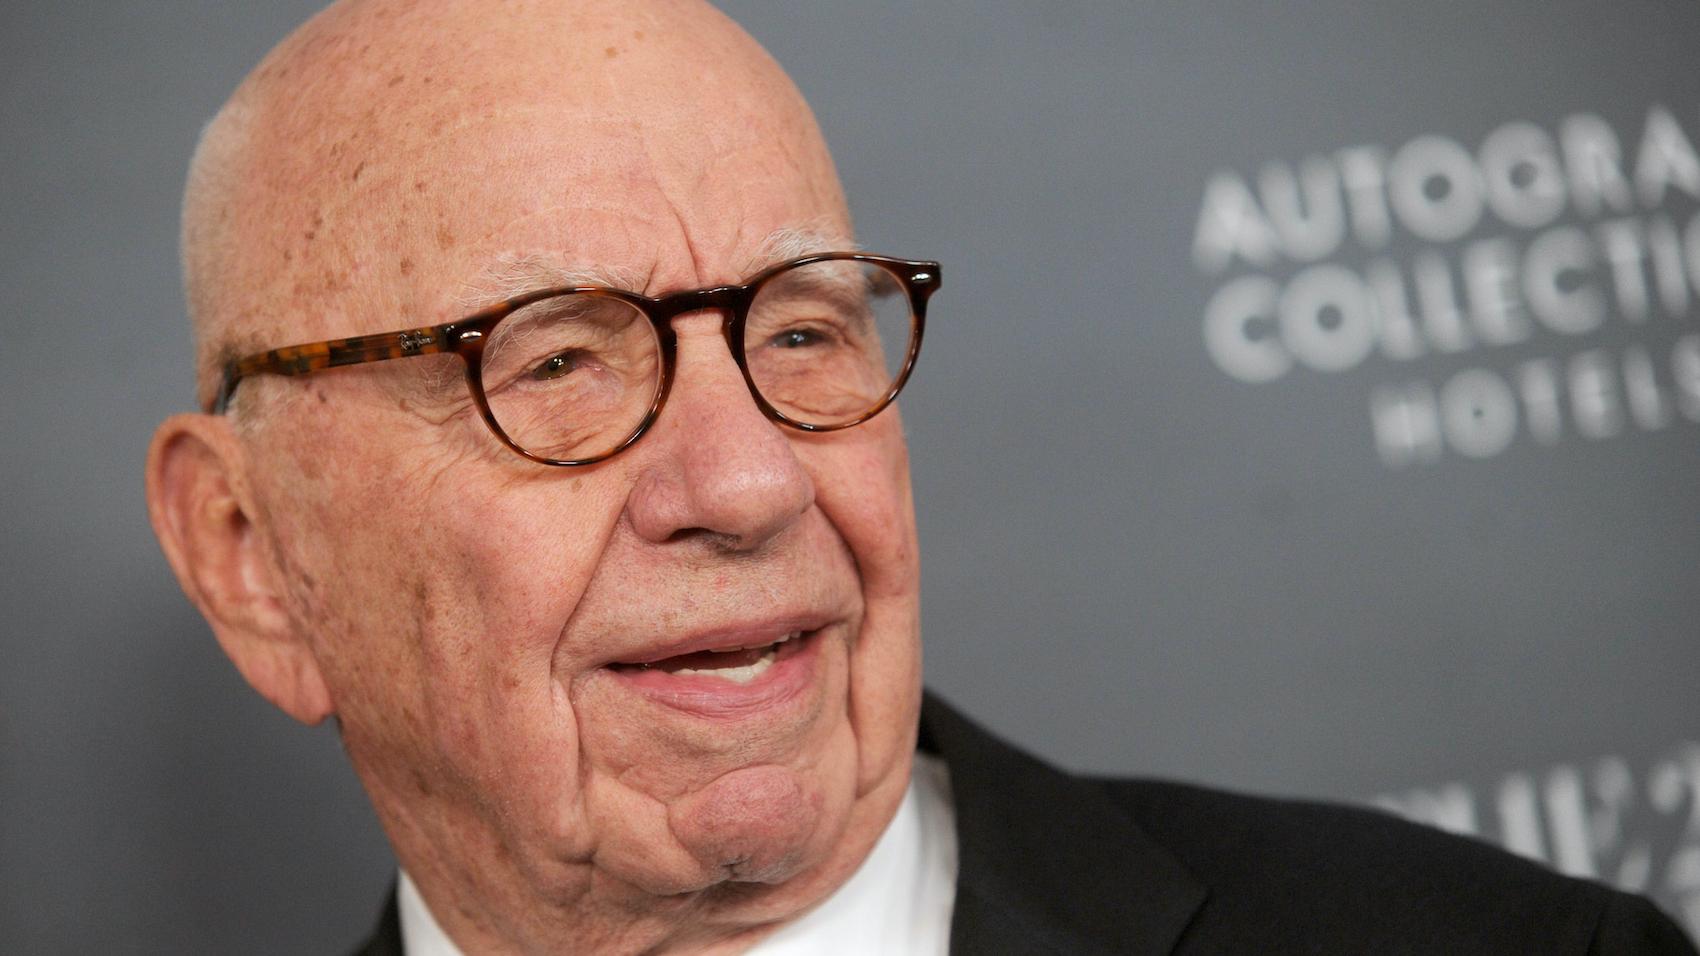 Rupert Murdoch, an Australian-born American media mogul.